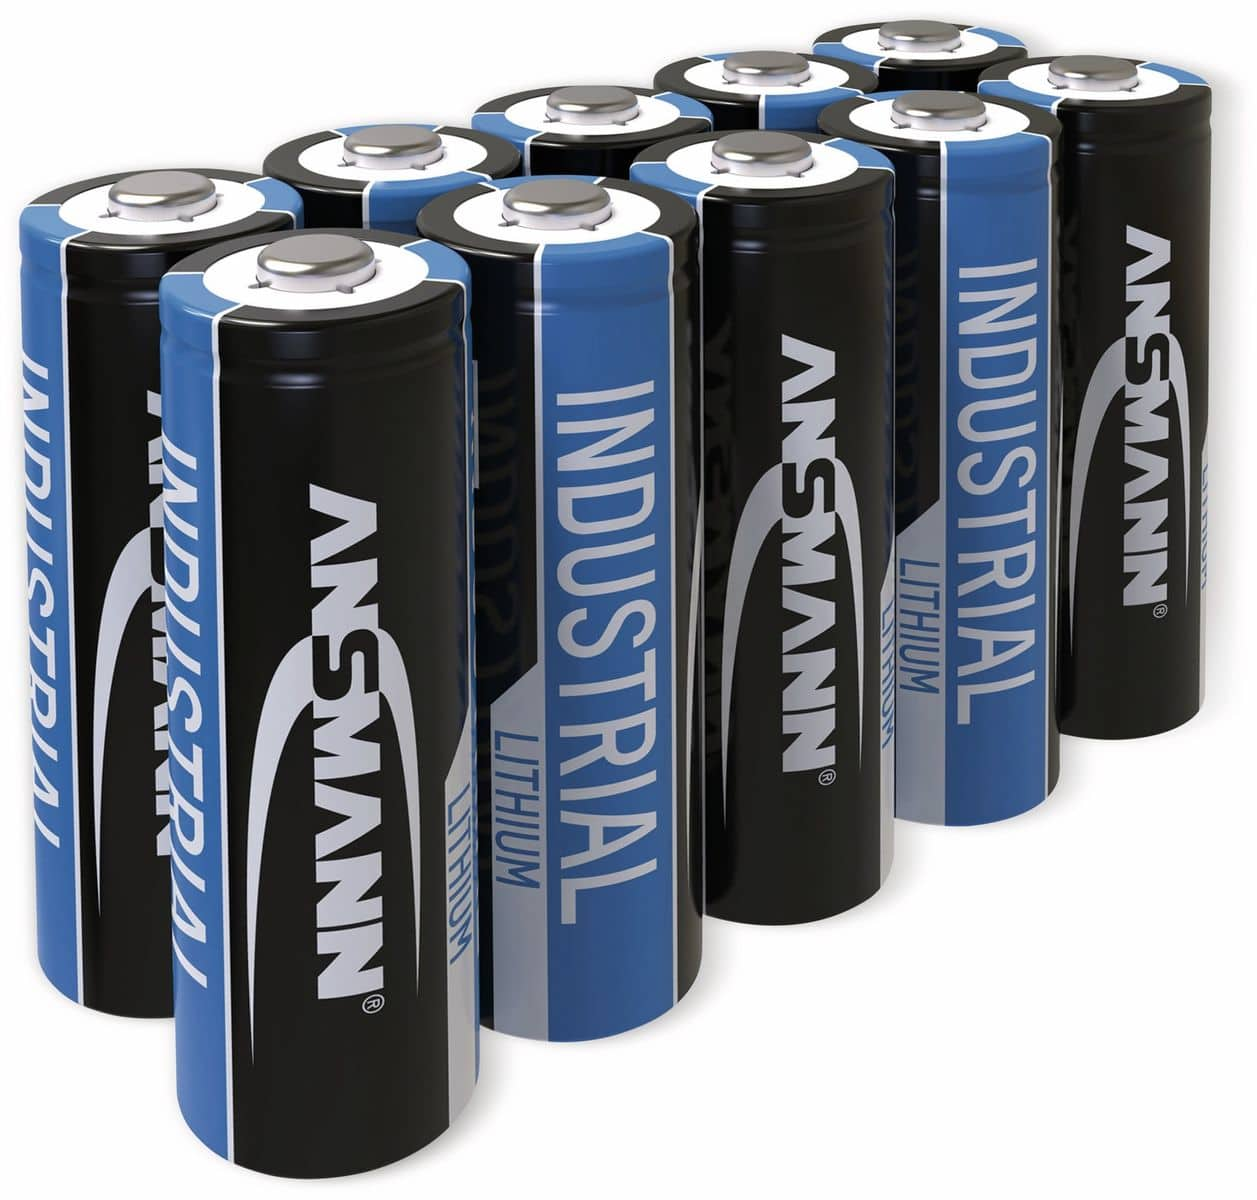 lithium batterie ansmann industrial mignon 10 st ck. Black Bedroom Furniture Sets. Home Design Ideas